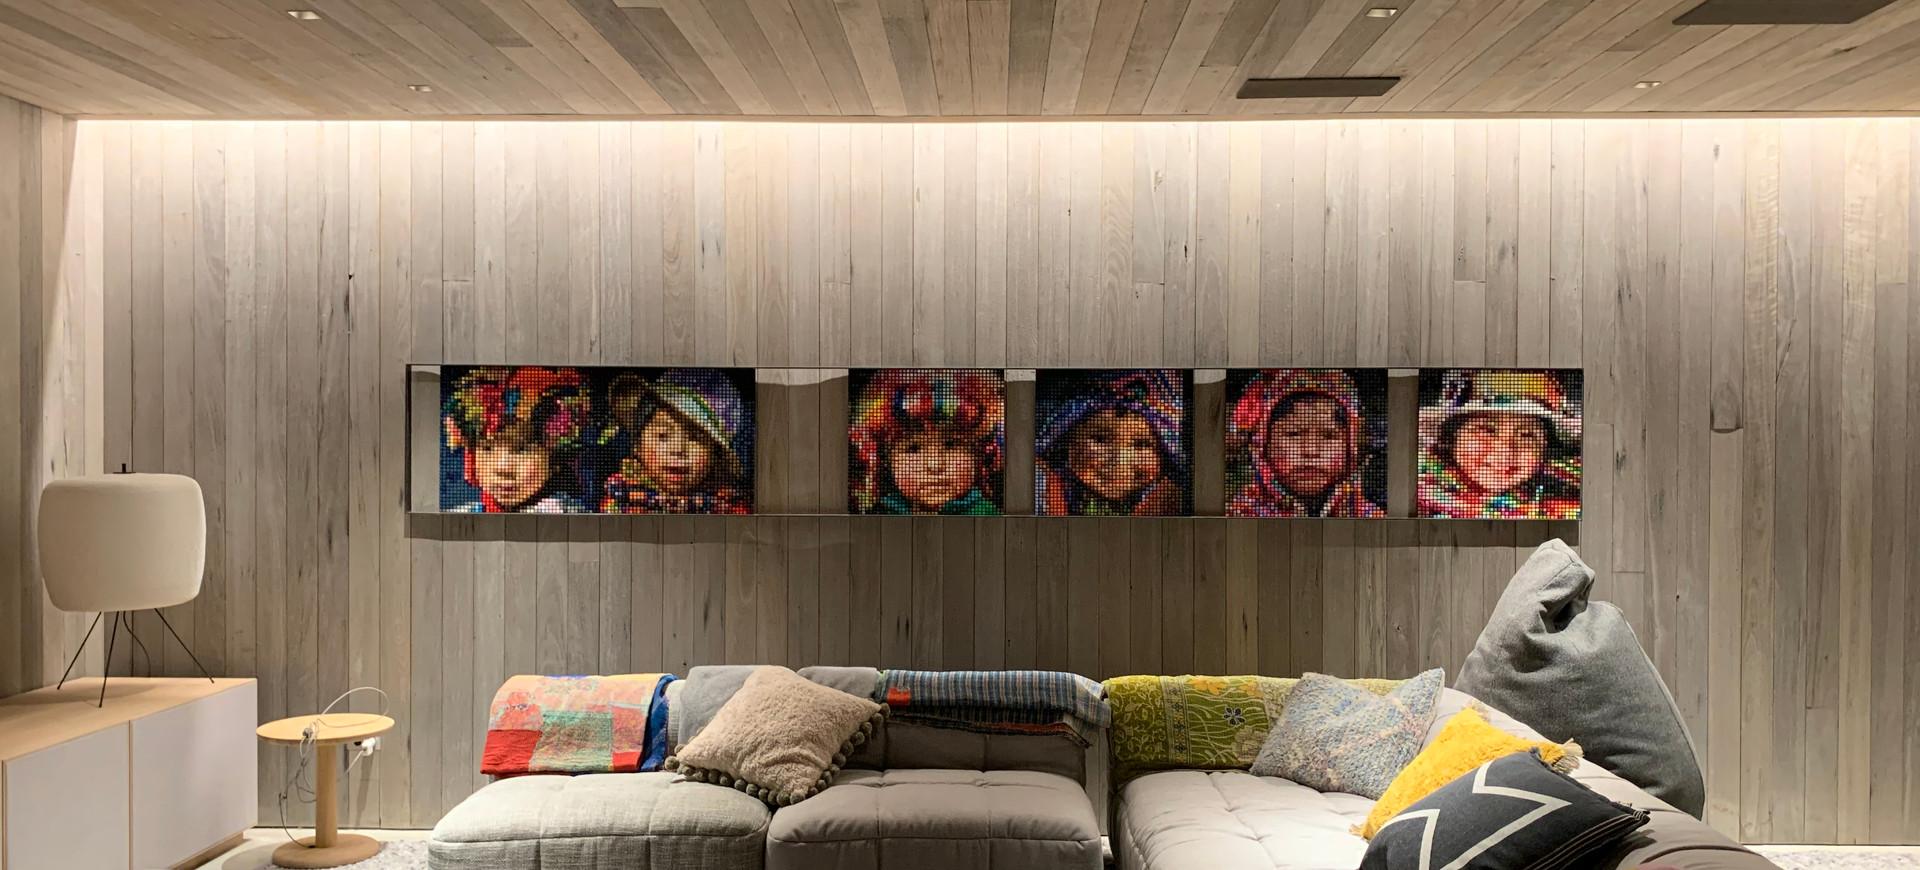 Peruvian kids series on site